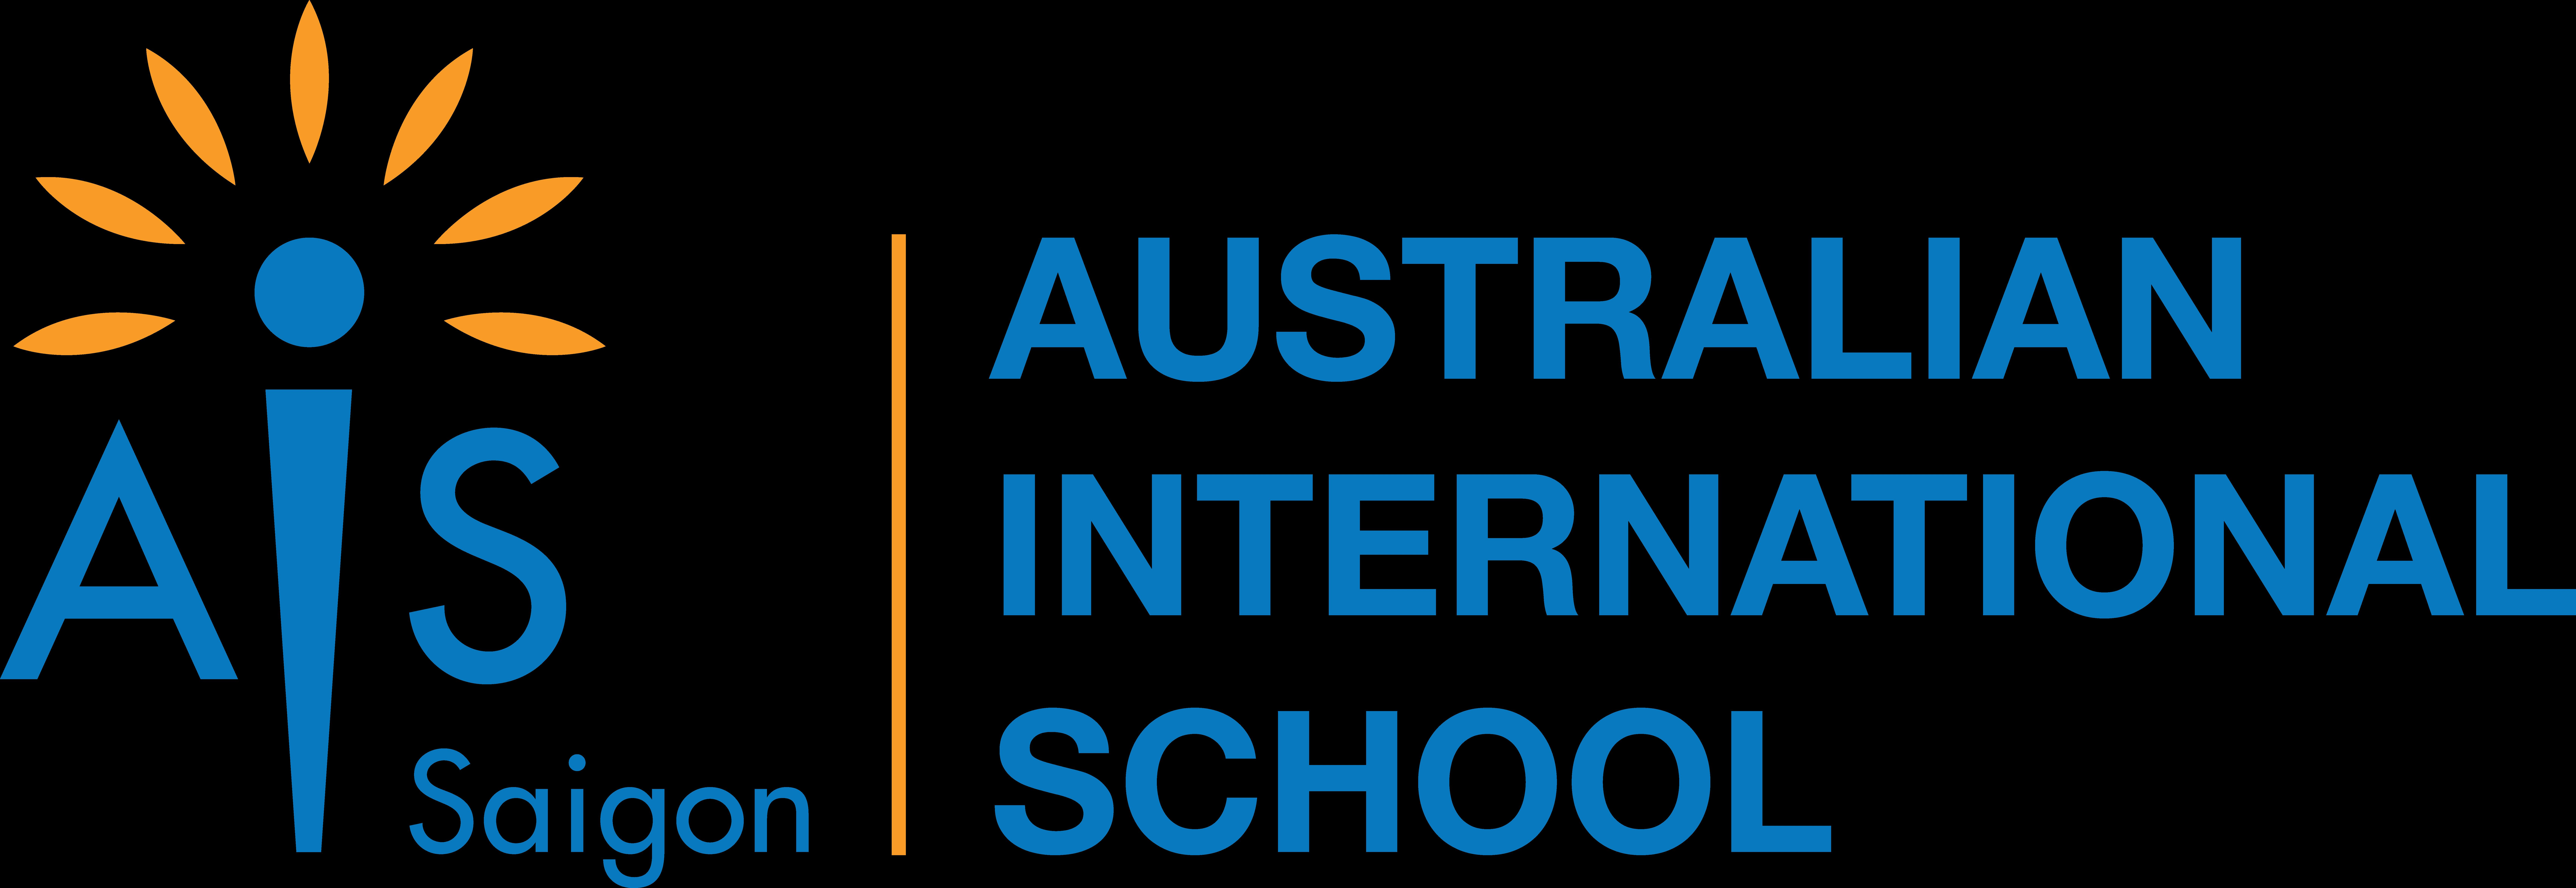 Australian International School awarded CIS Accreditation